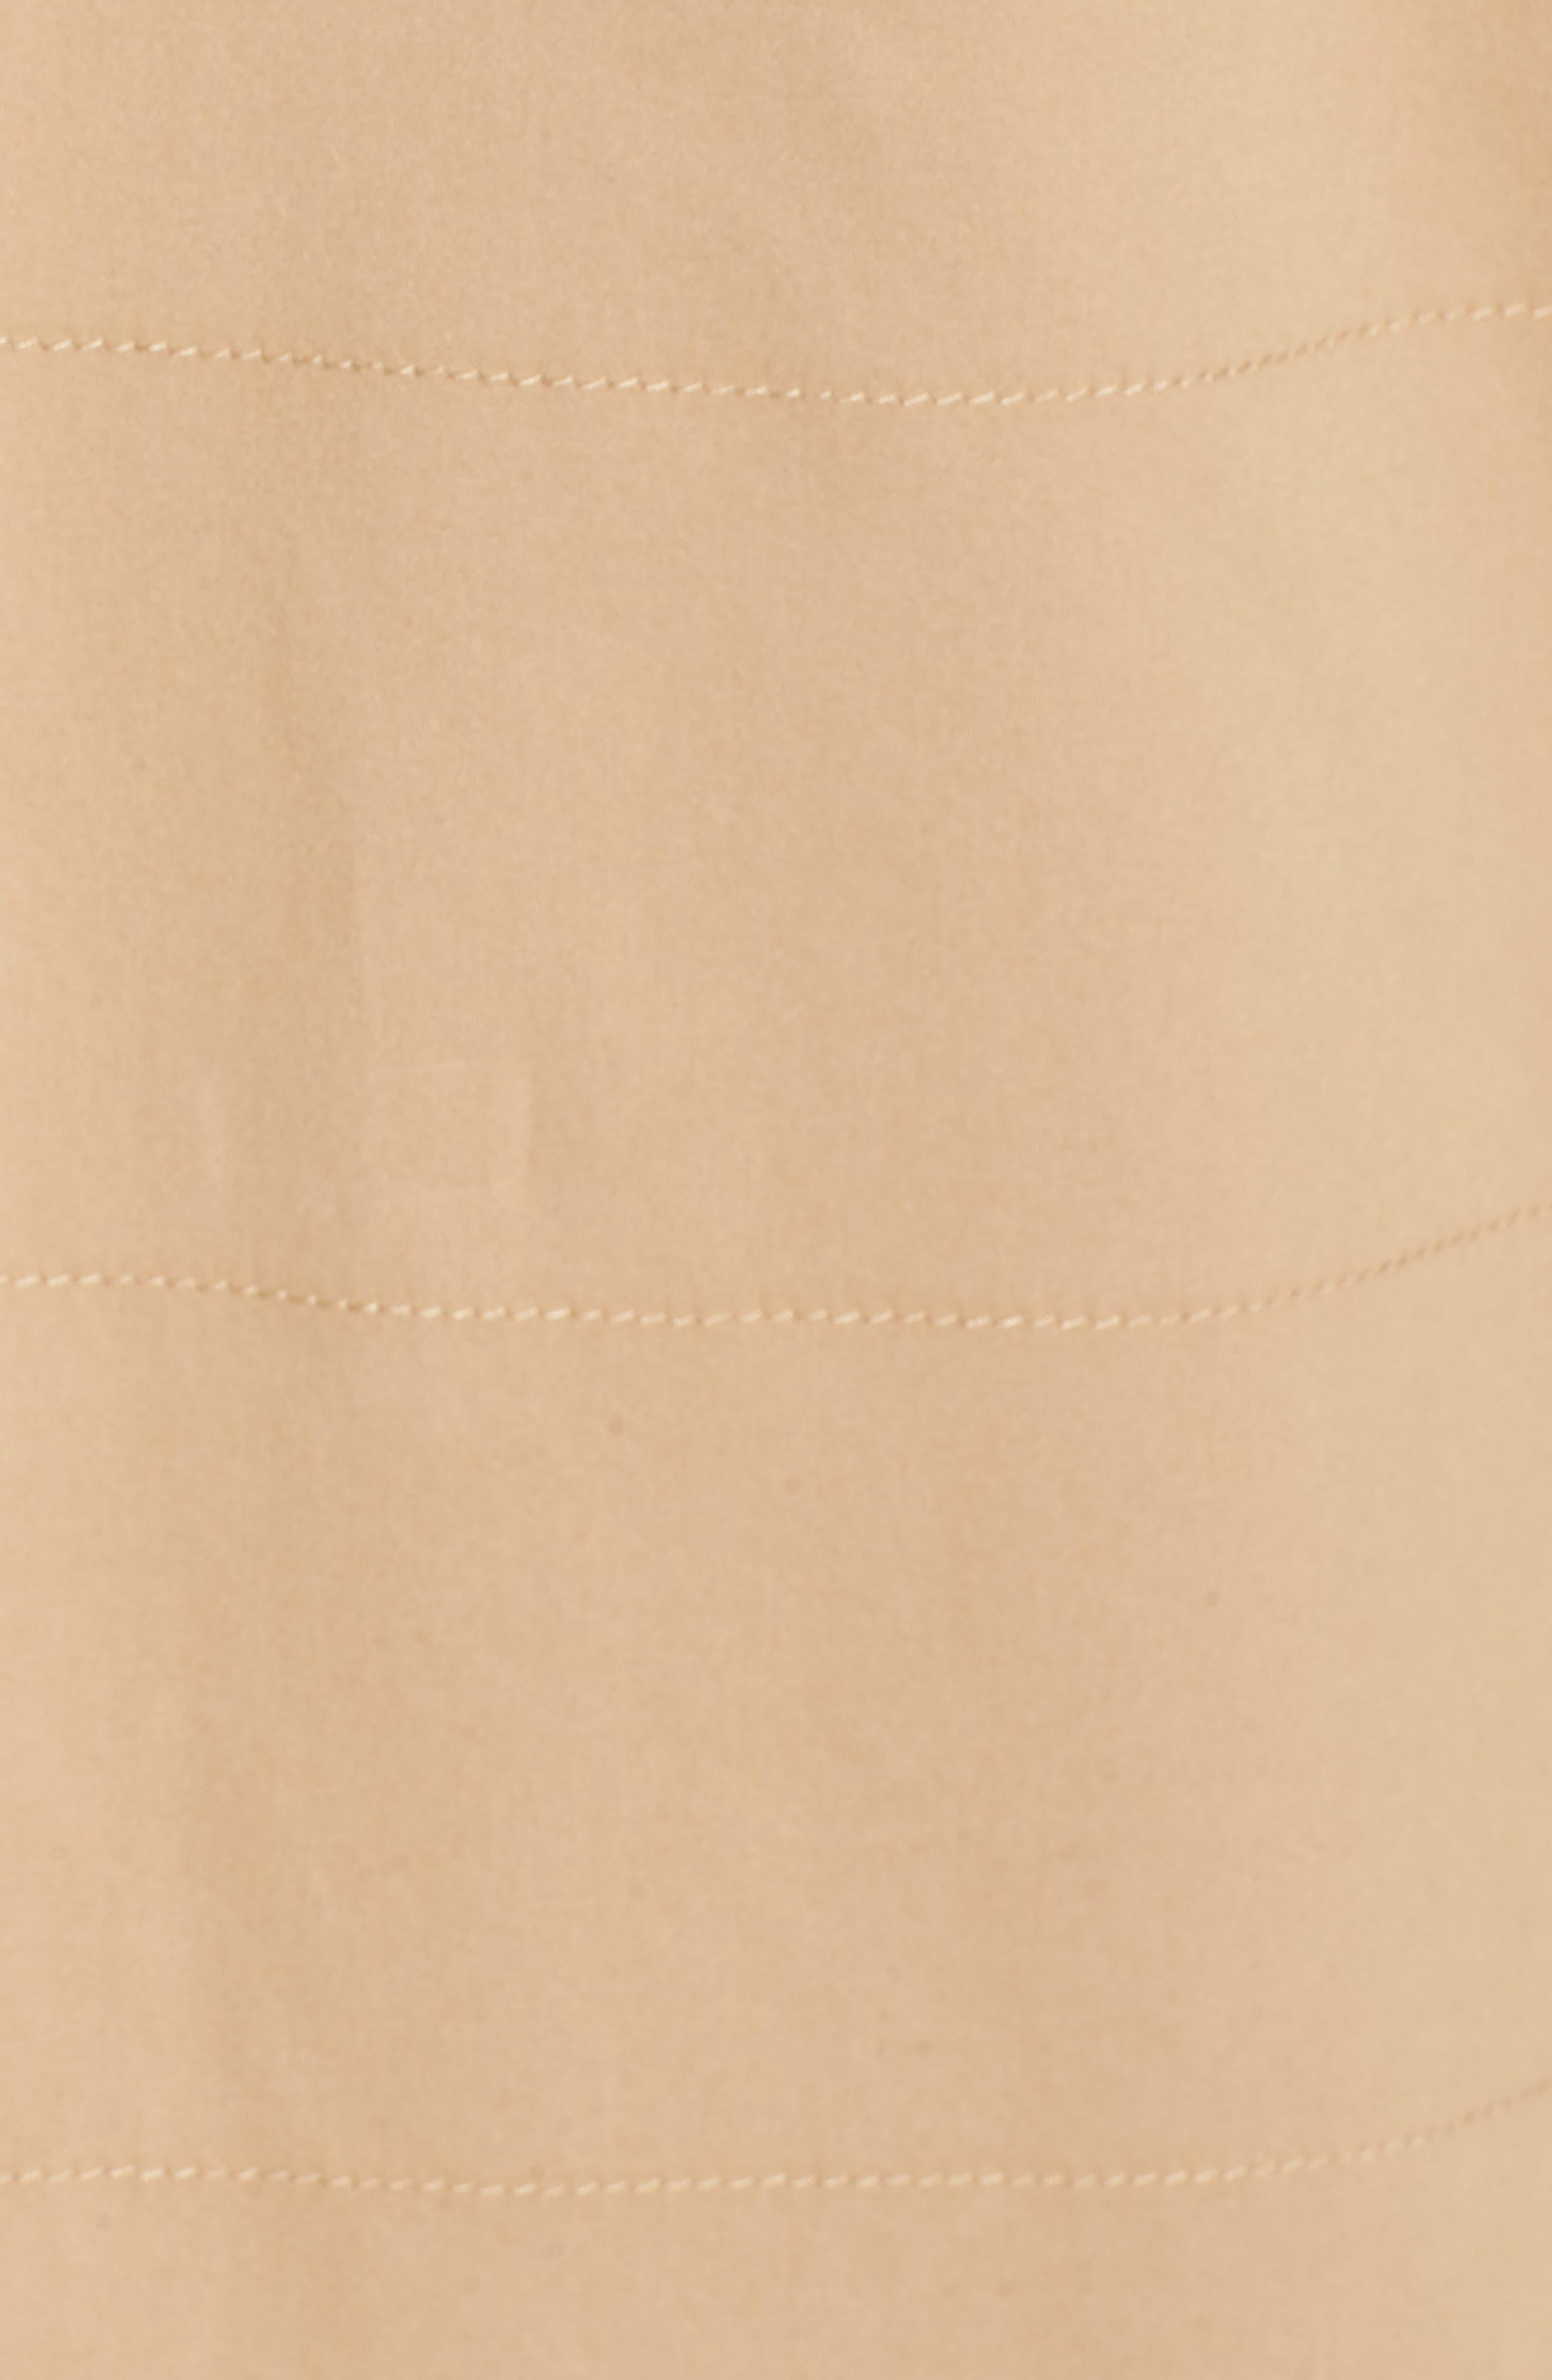 Snap Detail Trench Coat,                             Alternate thumbnail 6, color,